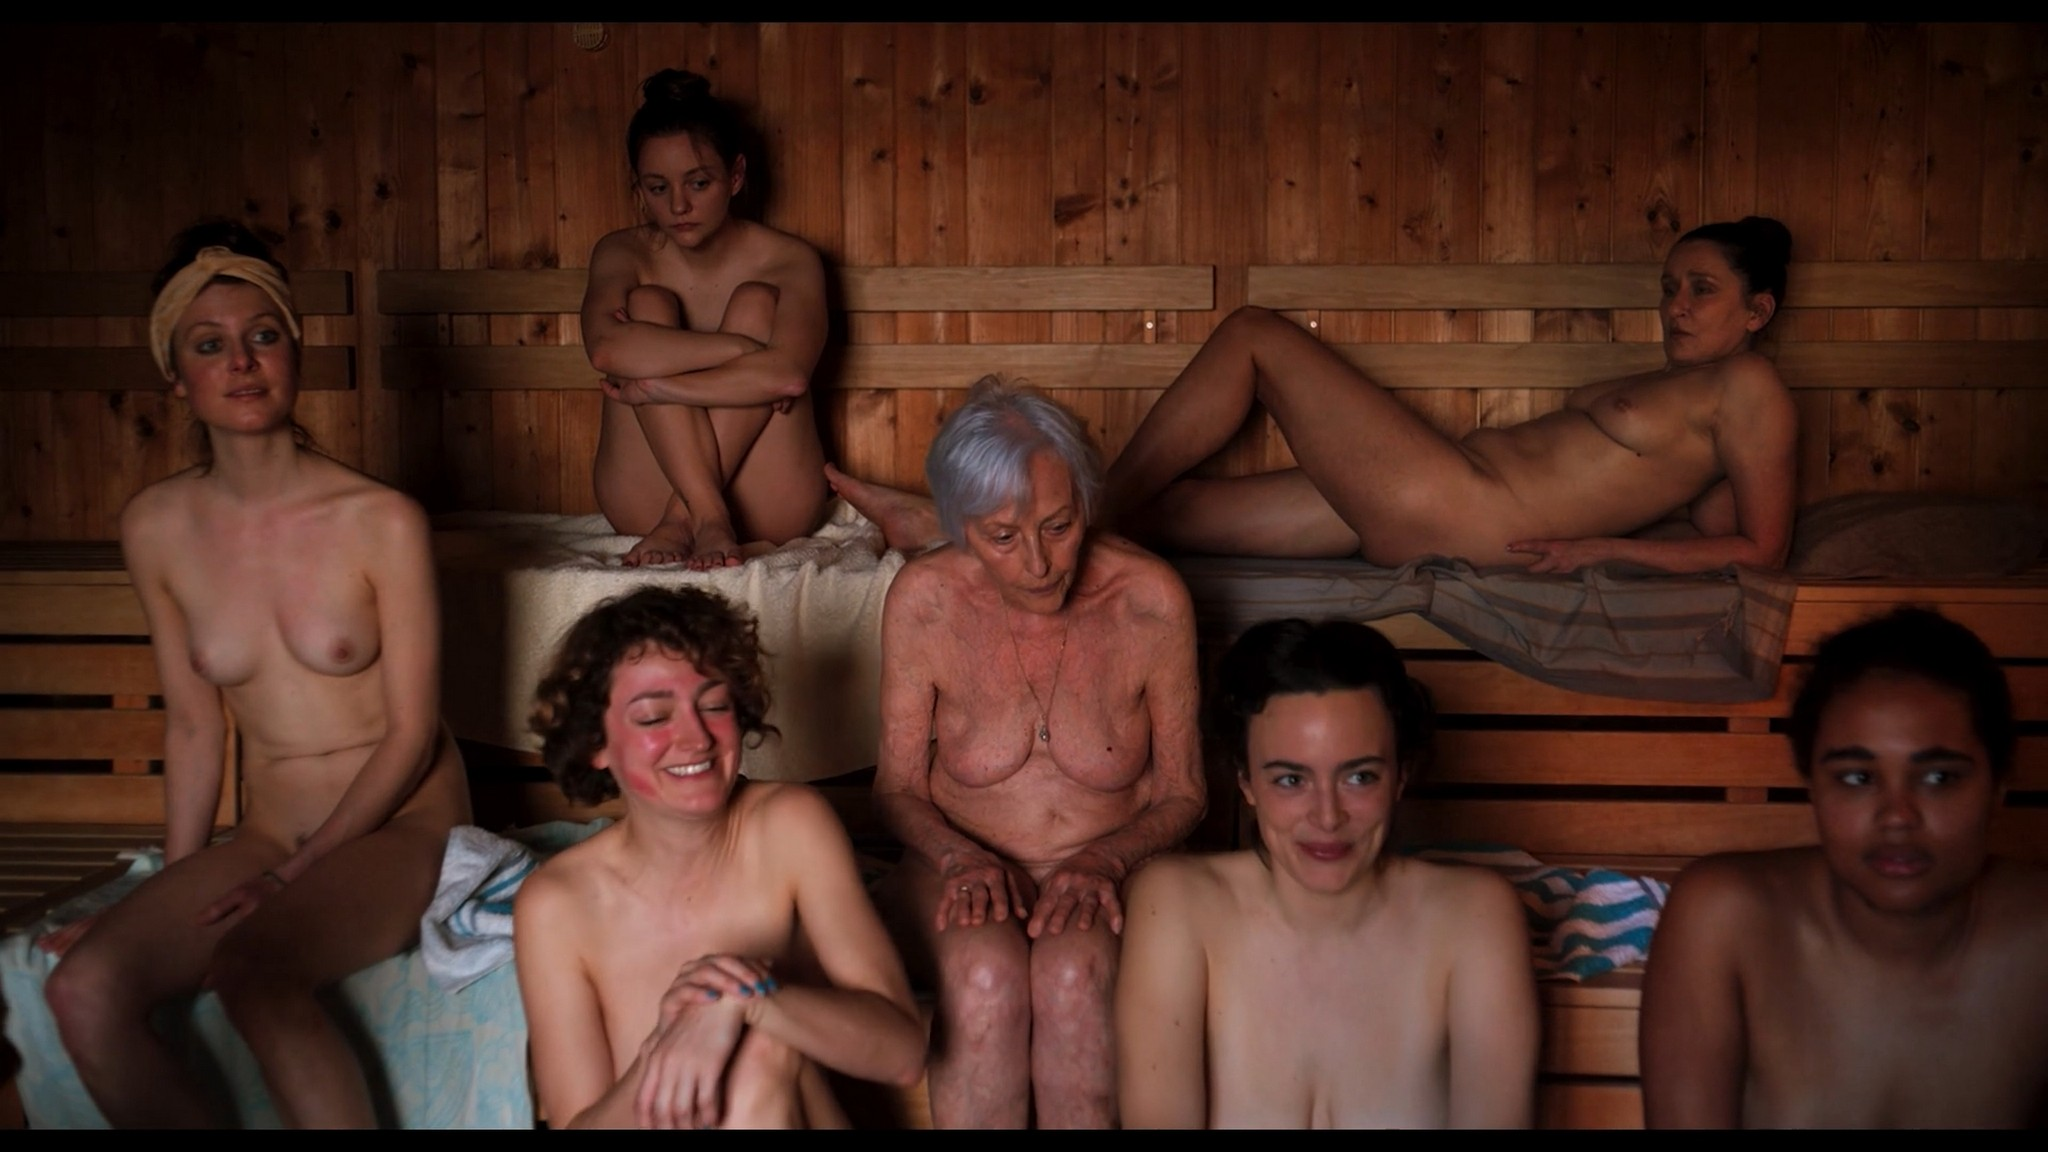 Antonia Bill nude full frontal Amanda da Gloria Helene Blechinger and others nude too Hitzig Ein Saunagang DE 2021 1080p 9